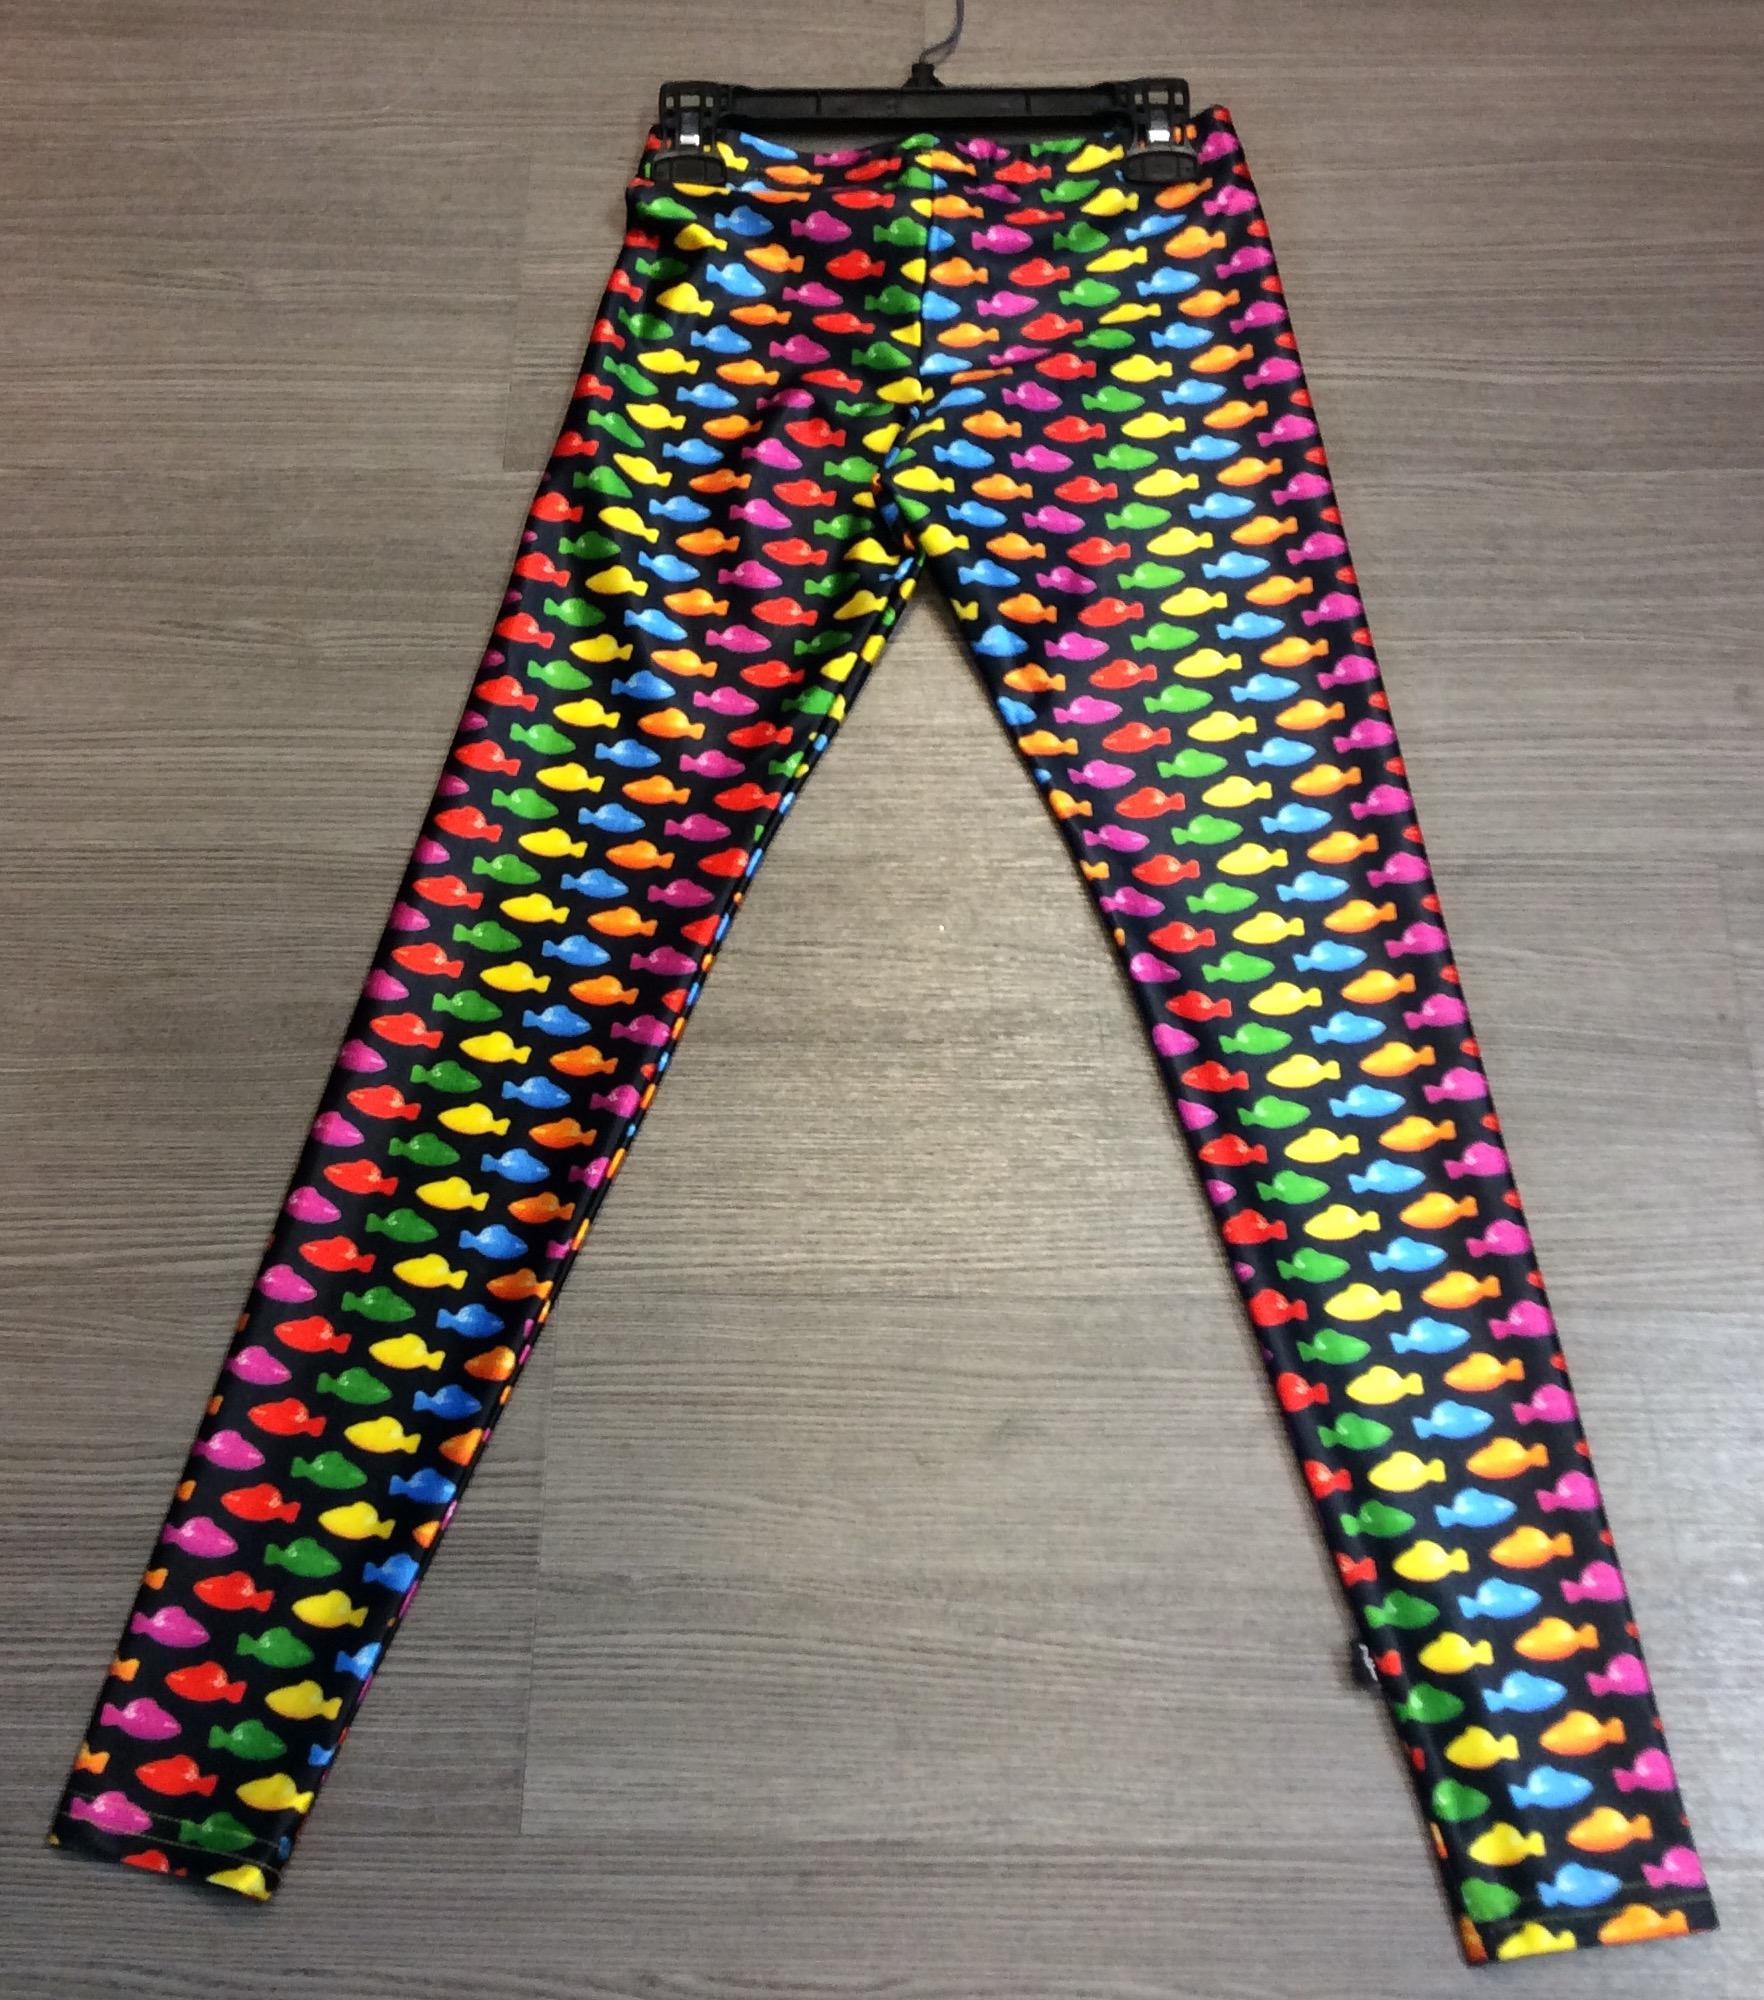 Zara-Terez-Size-Small-Black-Legging_6902A.jpg